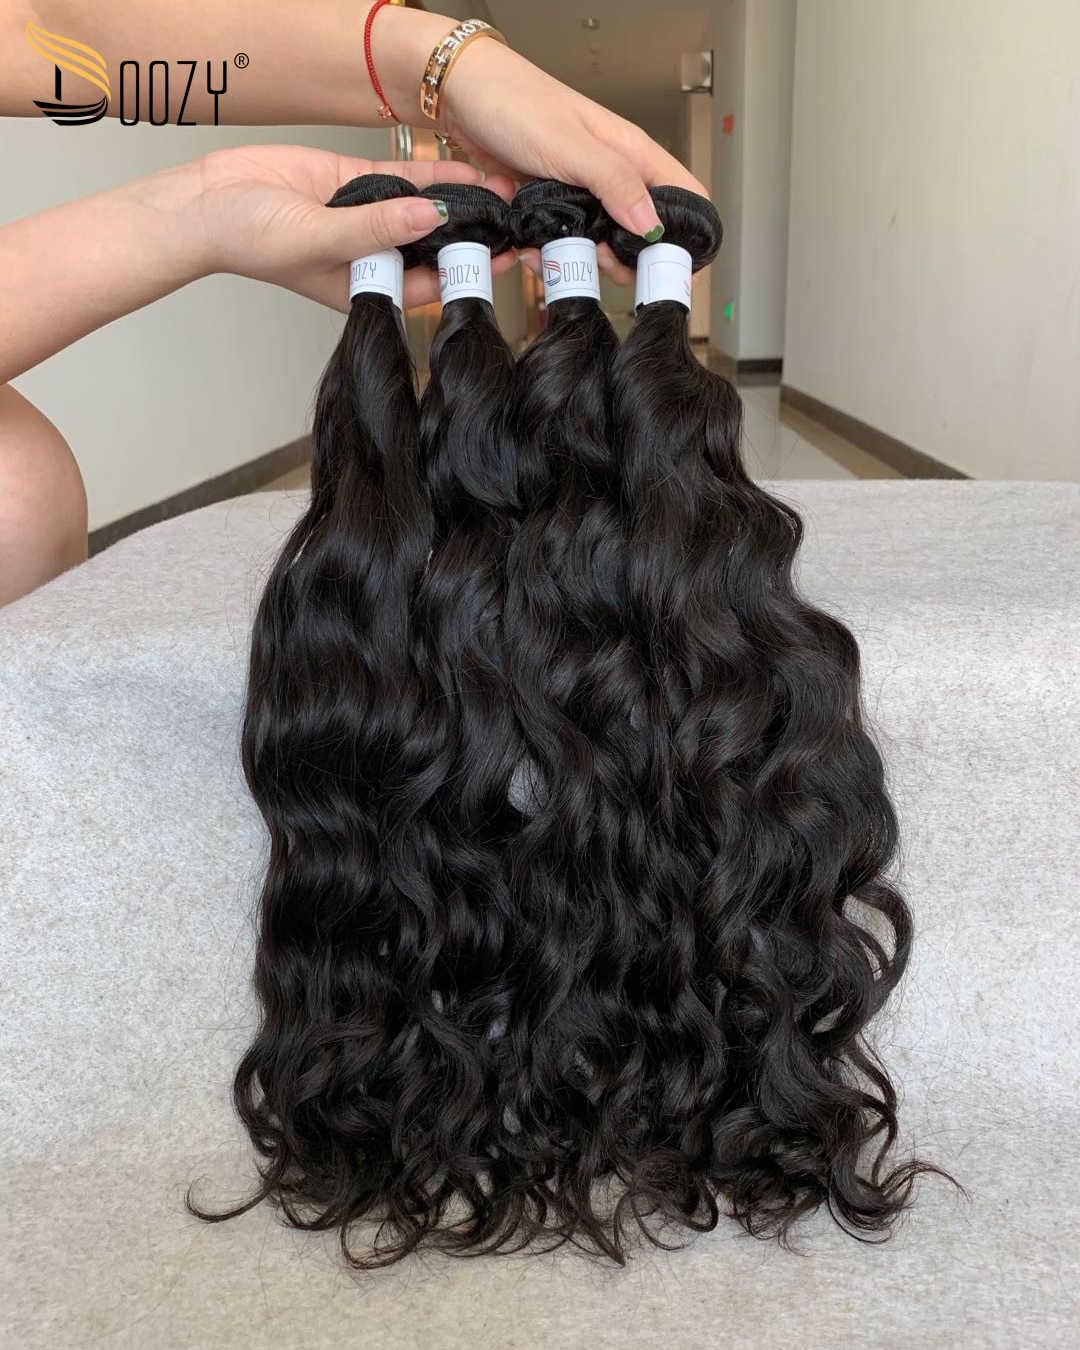 Doozy cabello peruano onda Natural cabello humano virgen 4 paquetes